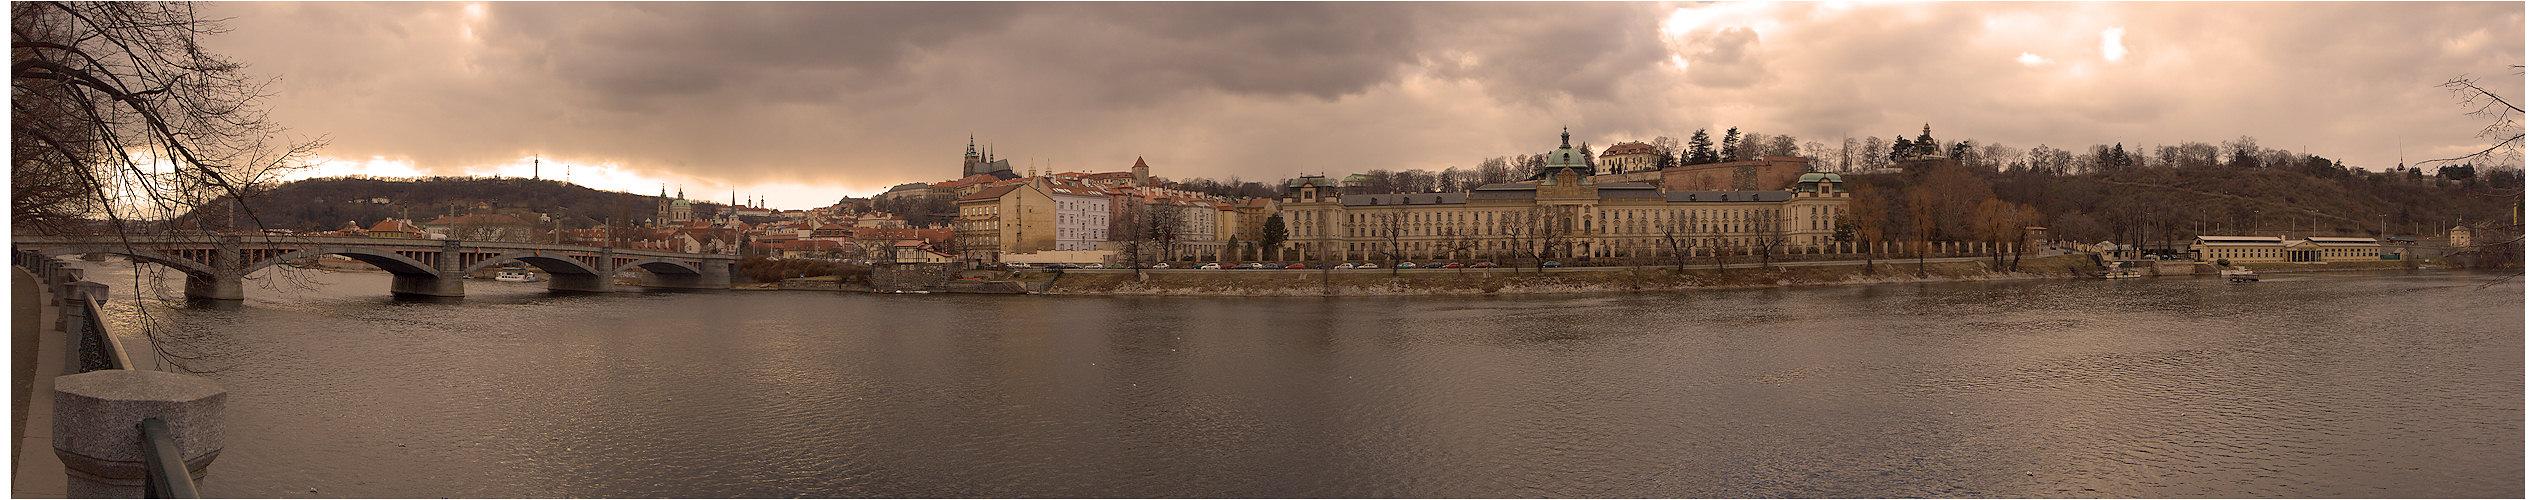 Prag in der Morgensonne